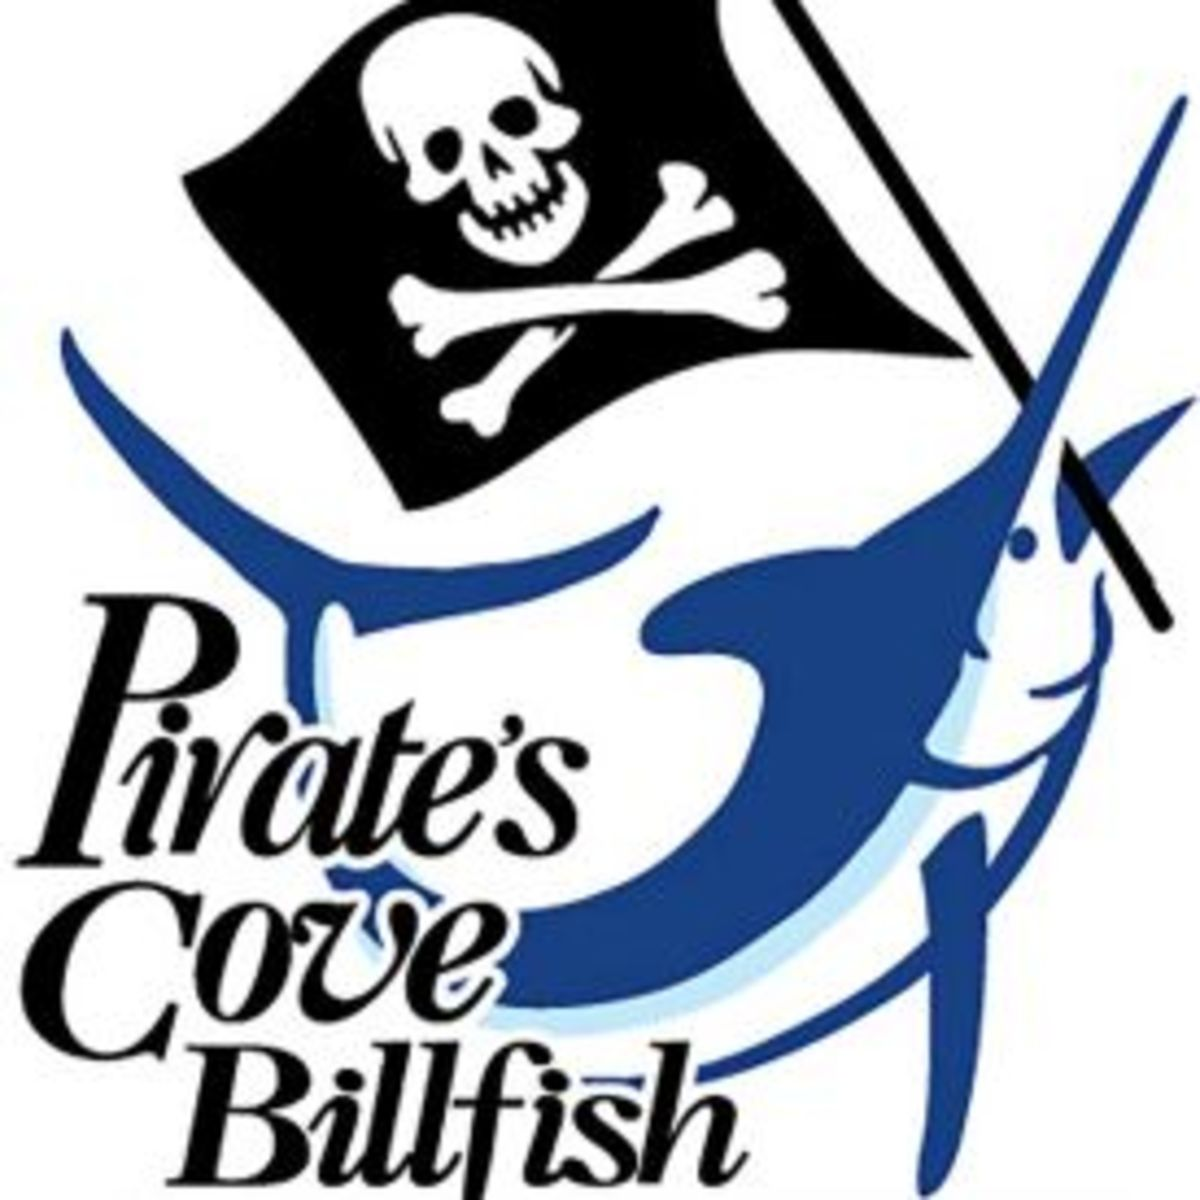 pirate-marlin-logo